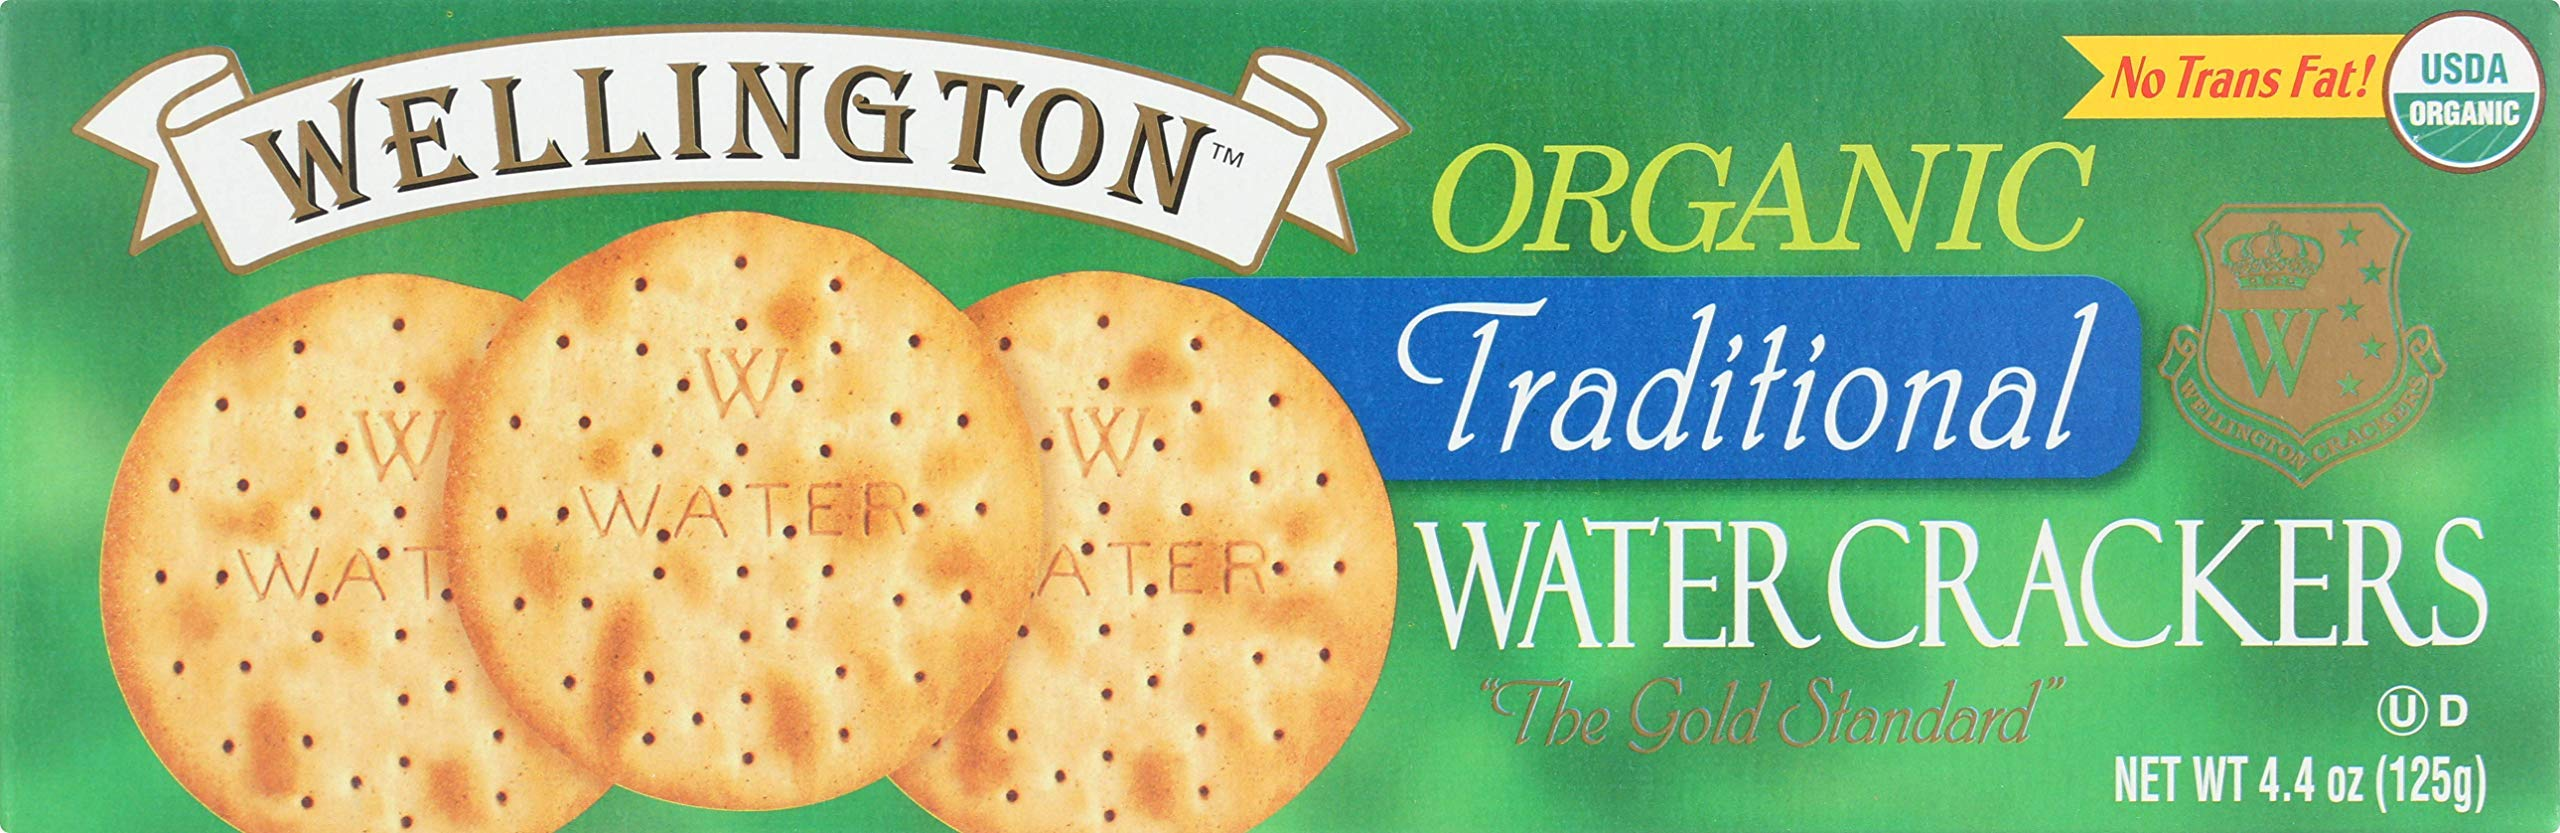 Wellington Crackers, Crackers Water Original Organic, 4.4 Ounce by Wellington Crackers